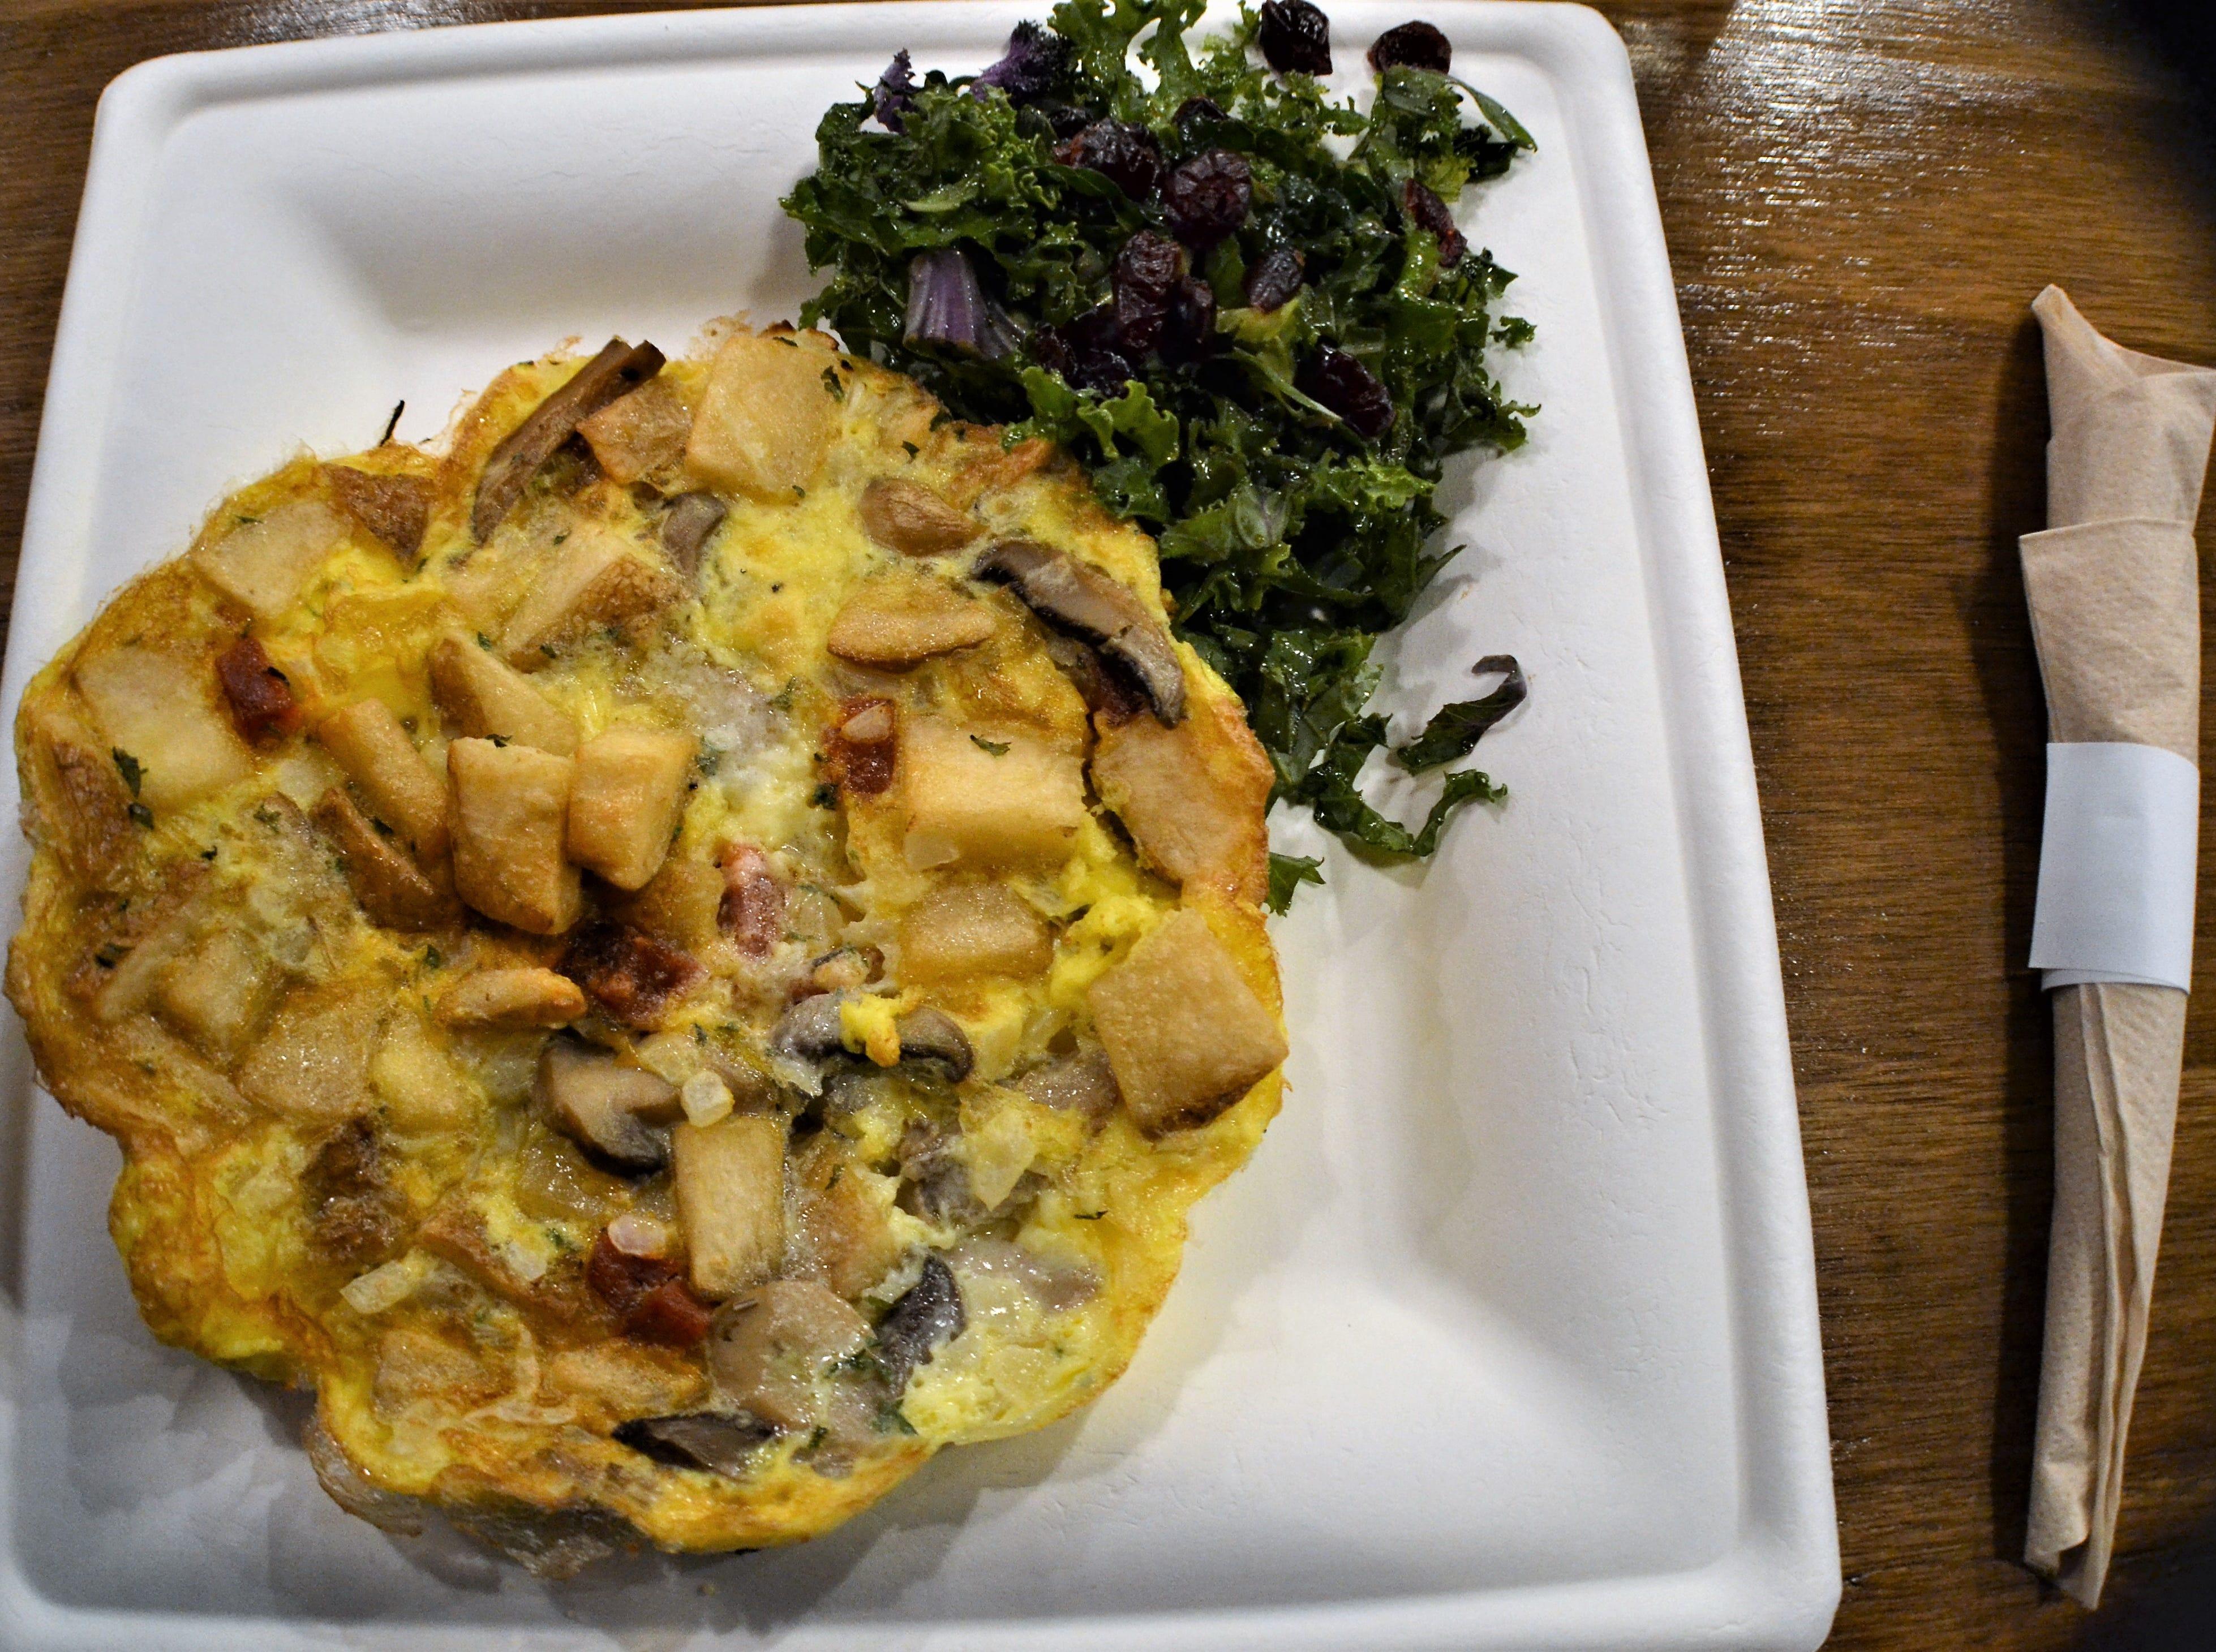 El sonador is one of three tortilla espanola omelettes available at El Charro Hipster.